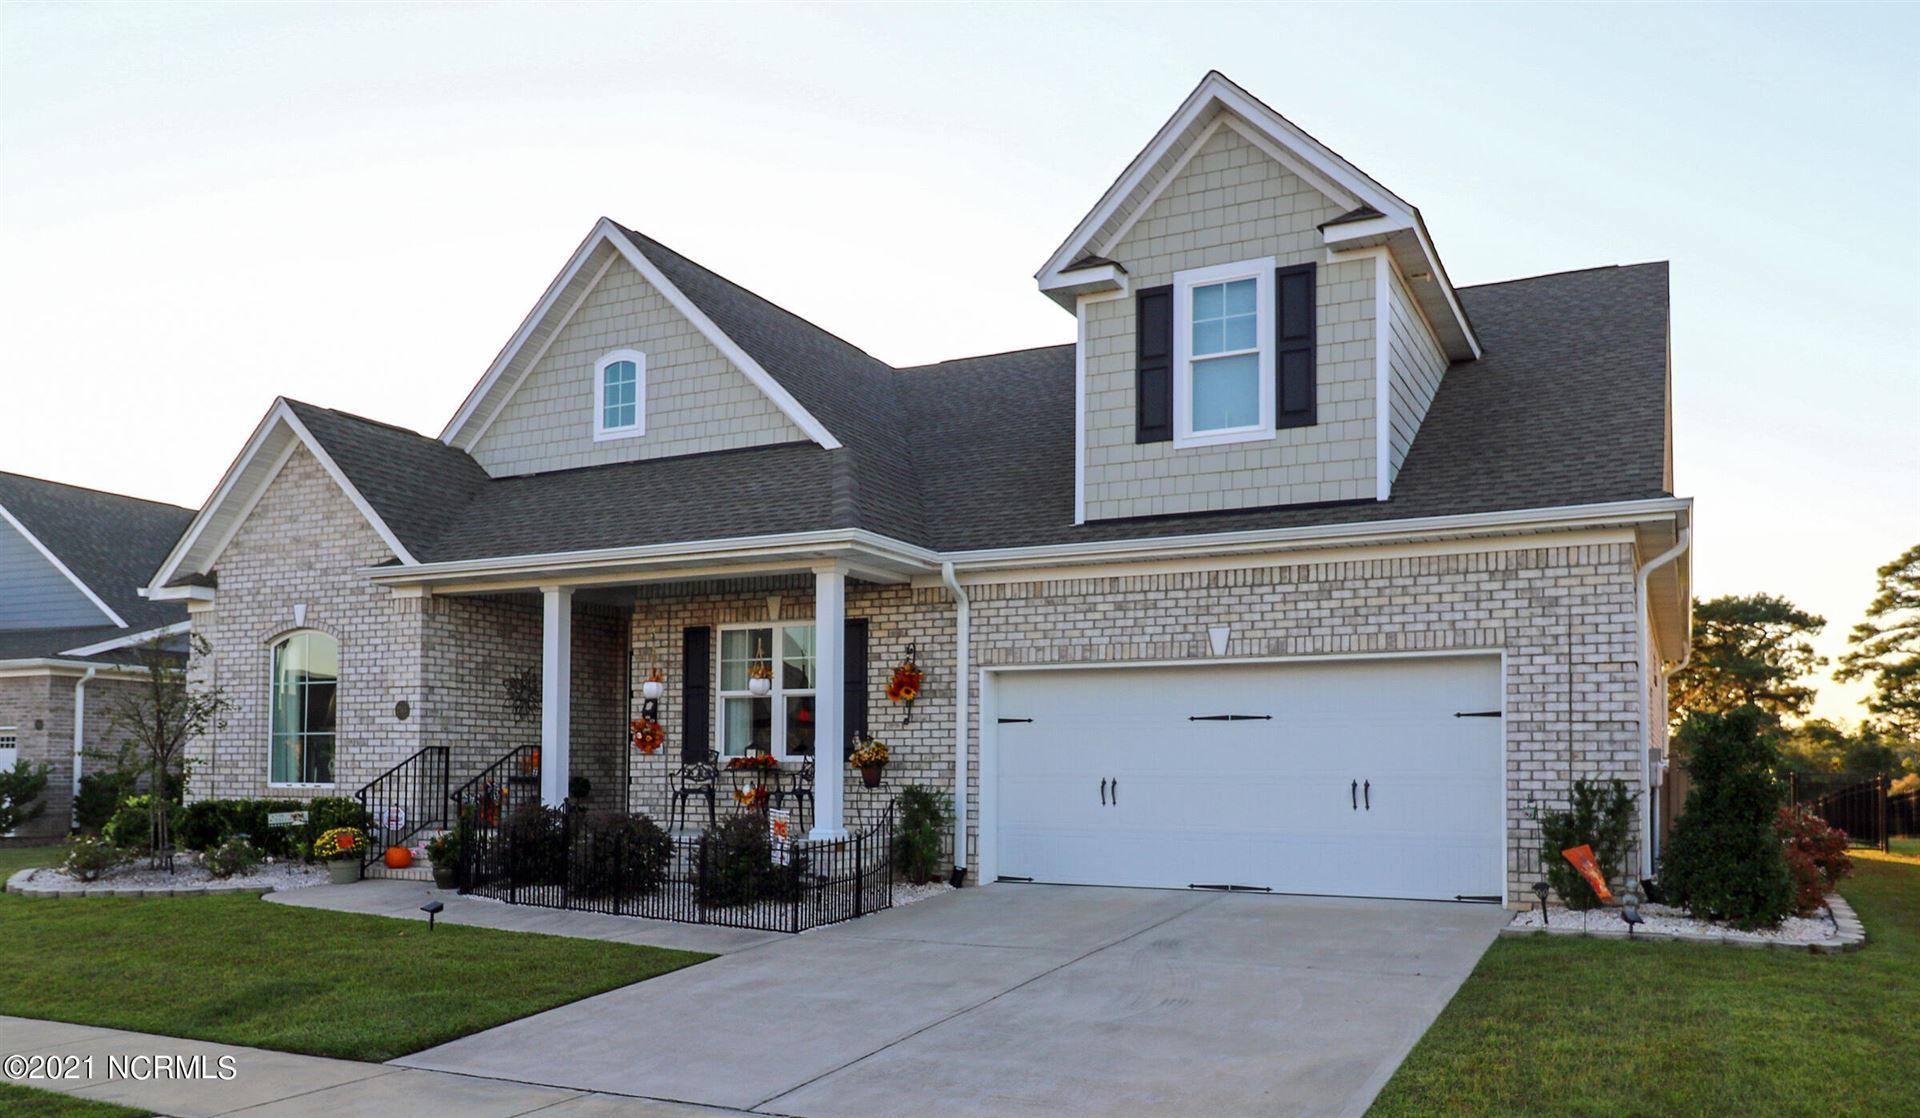 Photo of 2163 Springstone Drive, Leland, NC 28451 (MLS # 100295753)